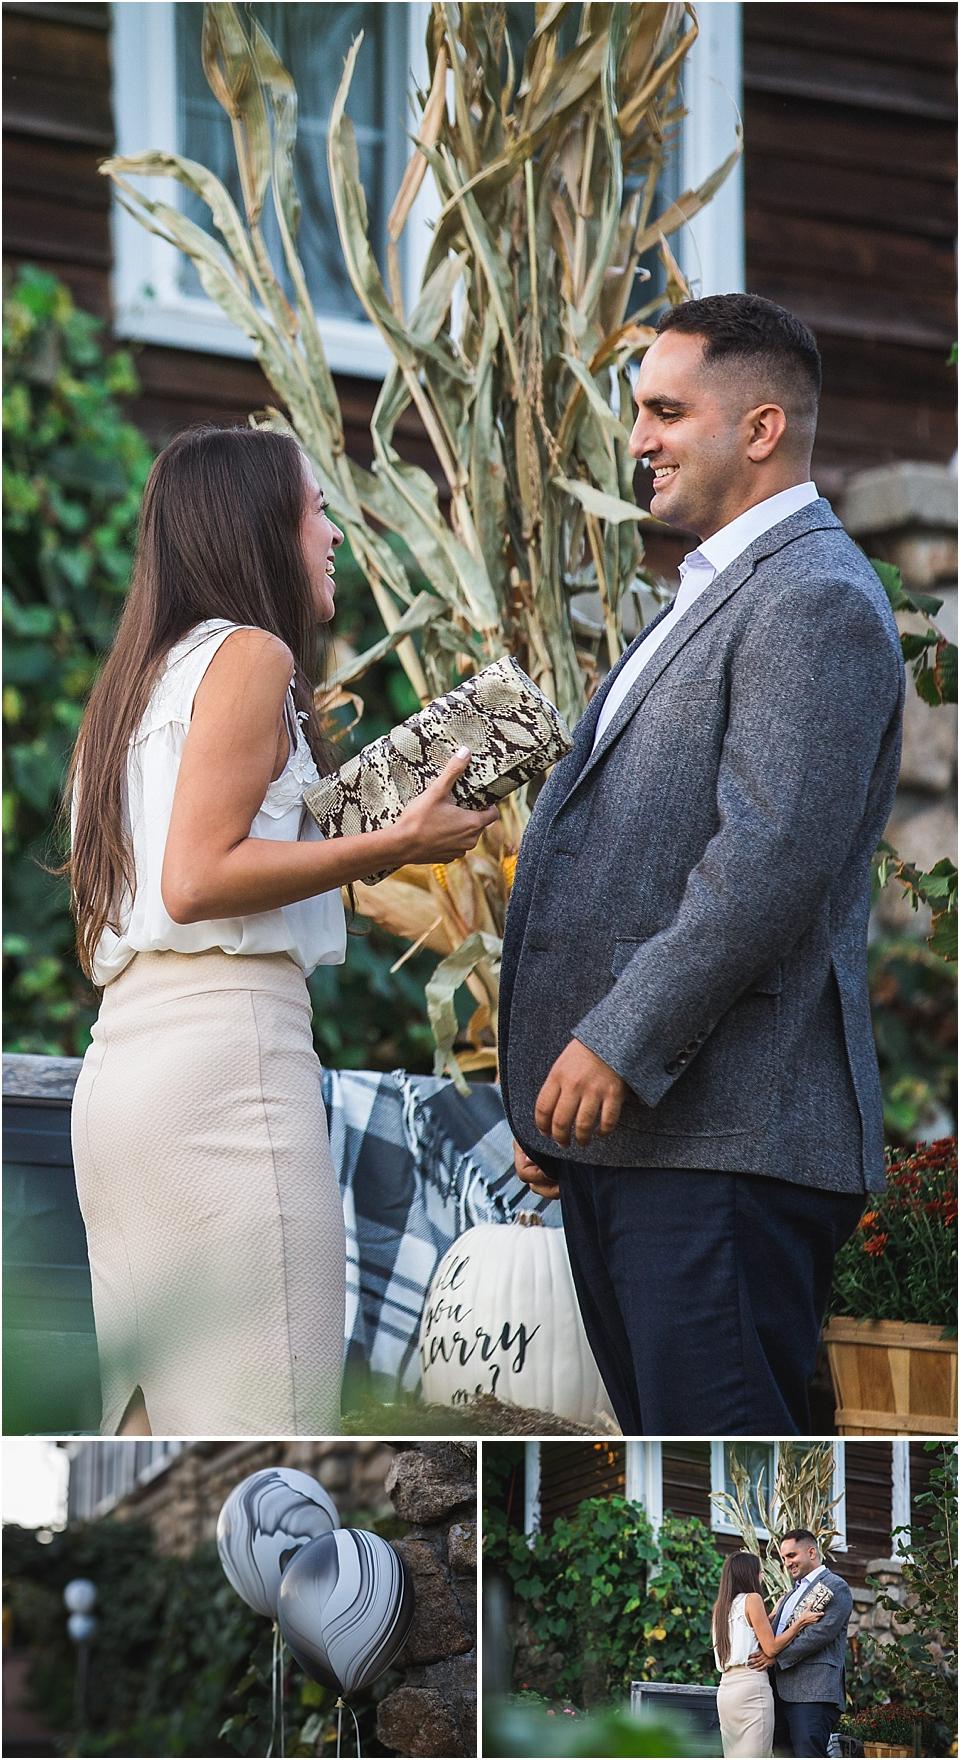 Erik & Jessica - Marriage Proposal - Kamp Weddings_0004.jpg